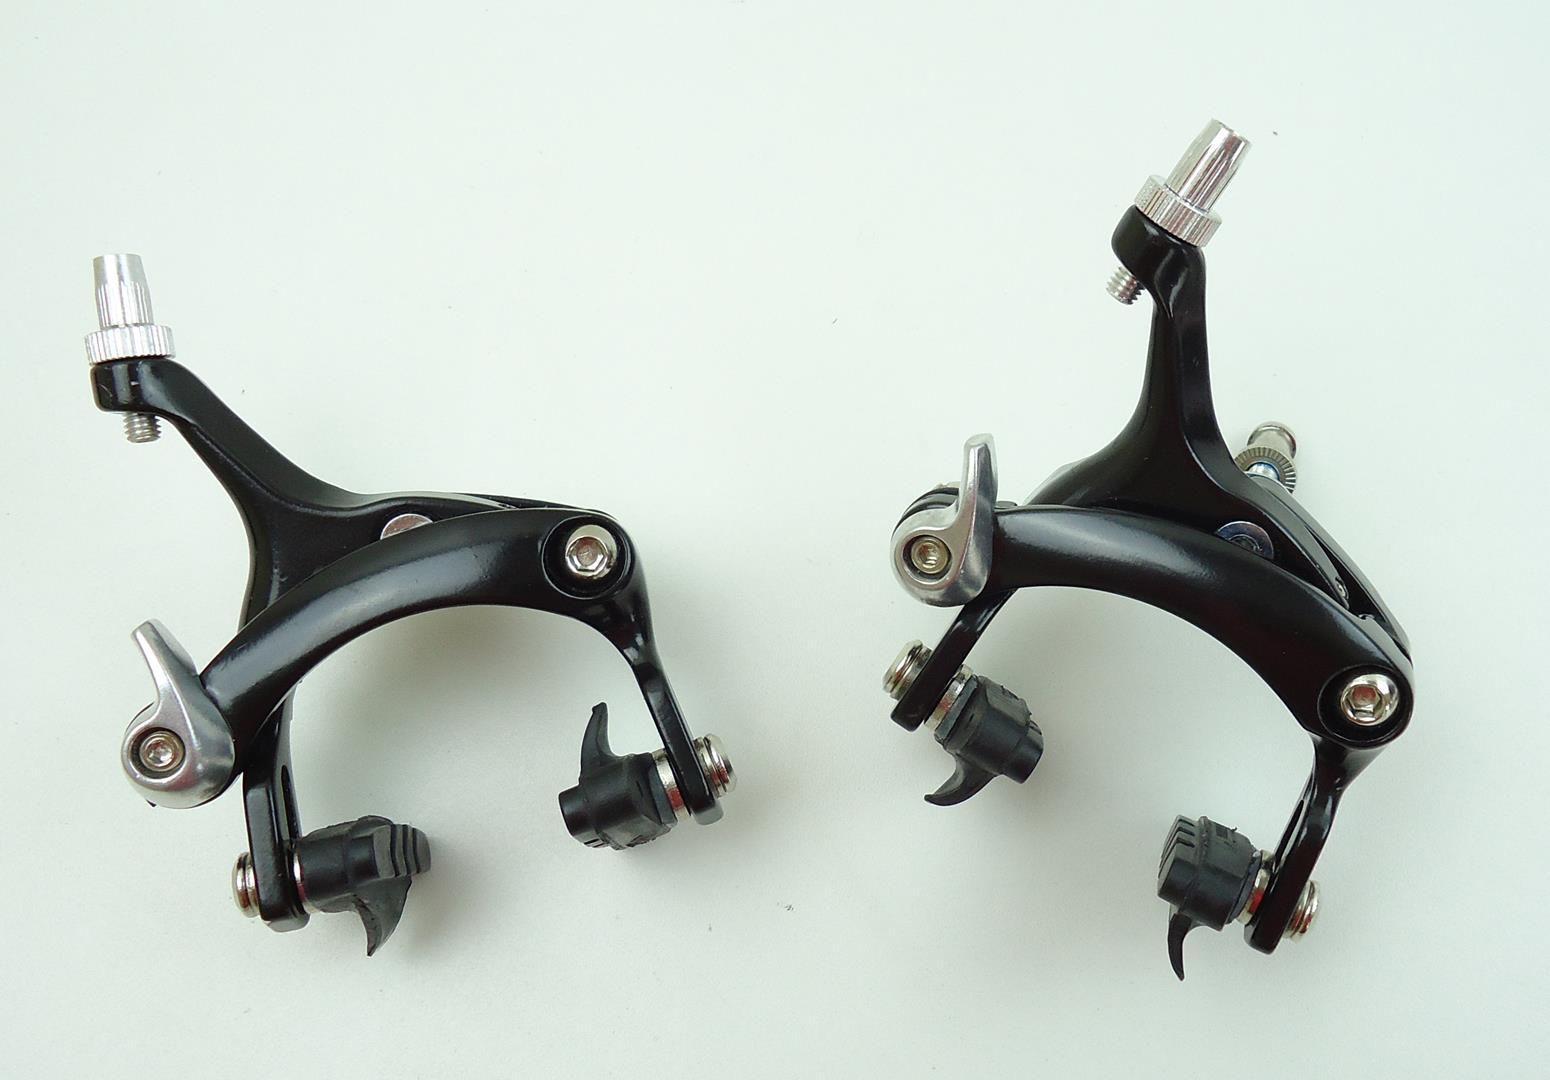 Grupo 6 peças para Bicicletas Speed Shimano Sora 3500 11-25 Road 9 velocidades